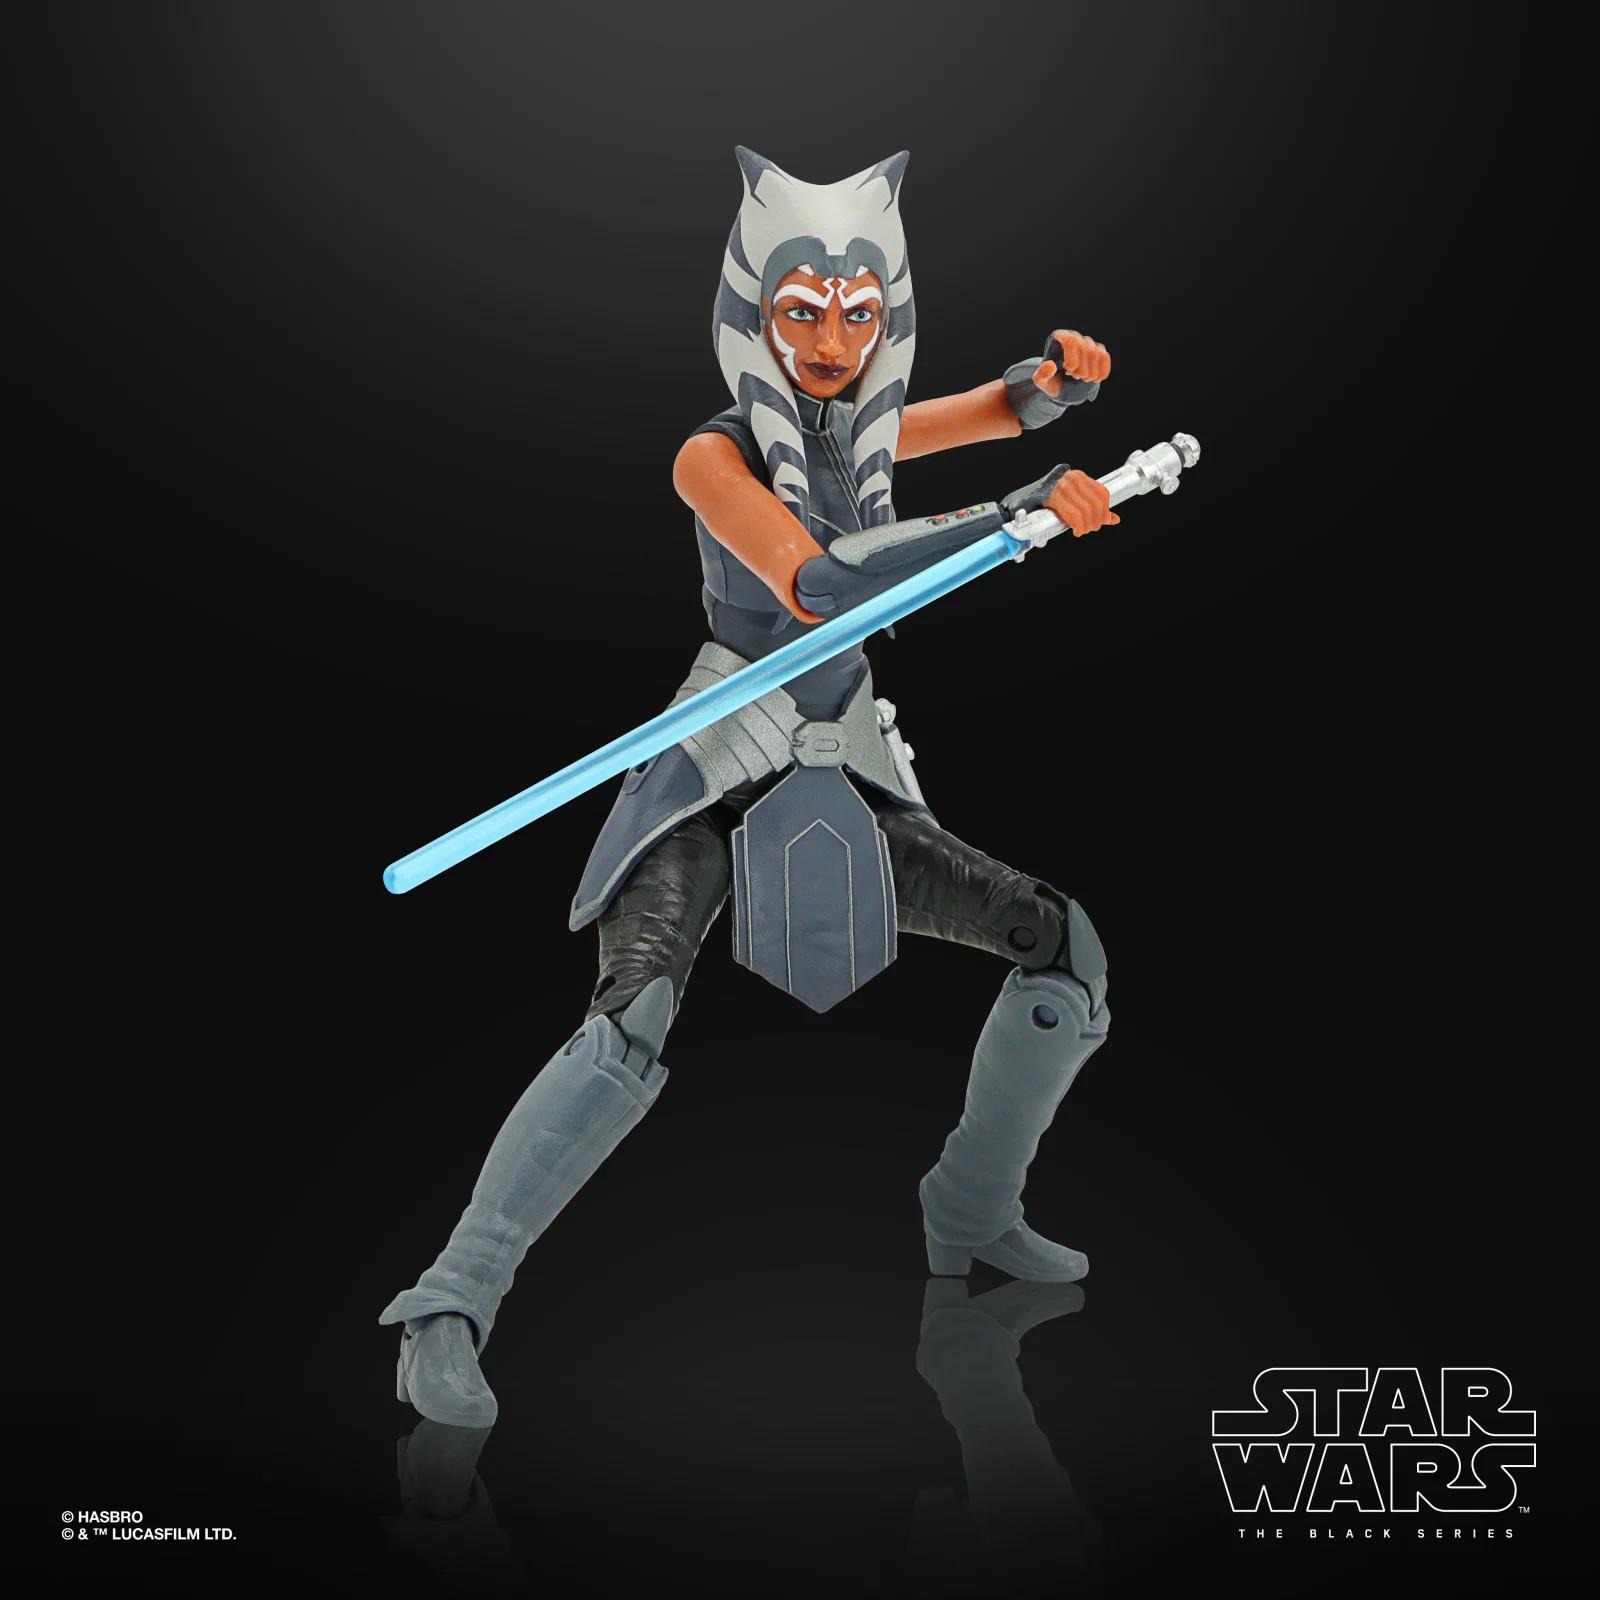 Hasbro-Star-Wars-Black-Series-Clone-Wars-Final-Season-Ahsoka-Tano-Promo-07.jpg